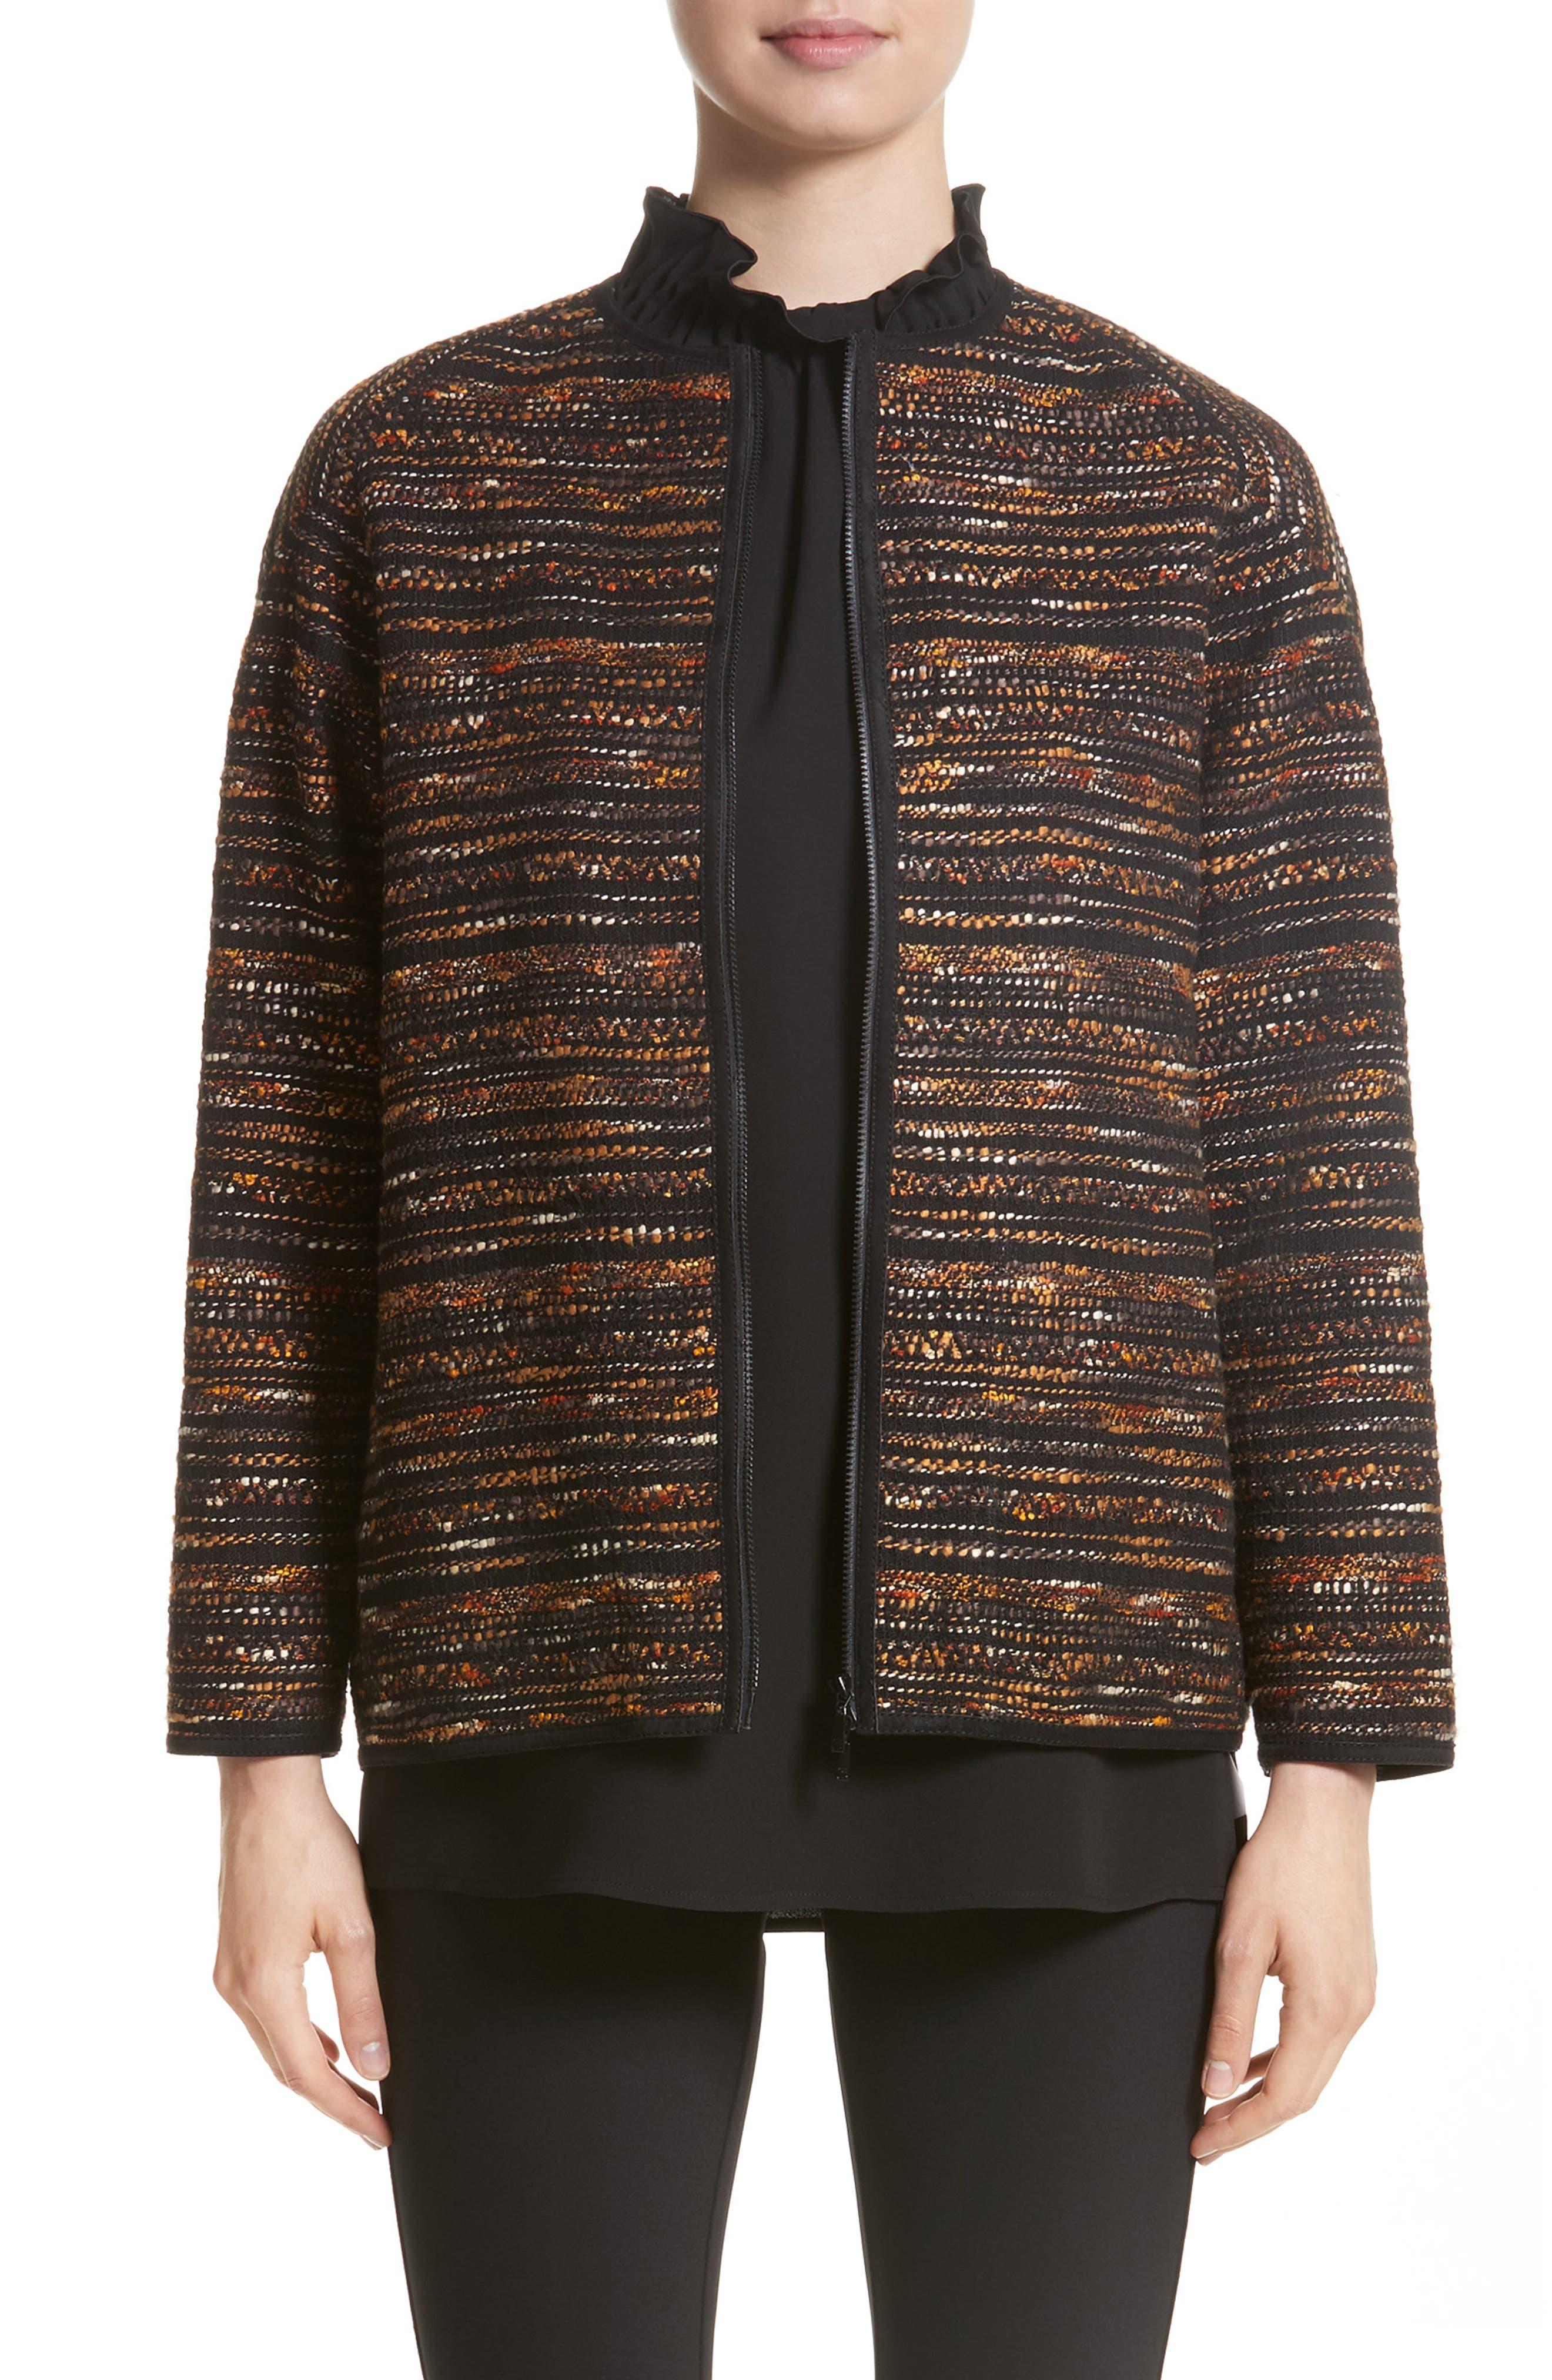 Alternate Image 1 Selected - Lafayette 148 New York Alexa Tweed Jacket